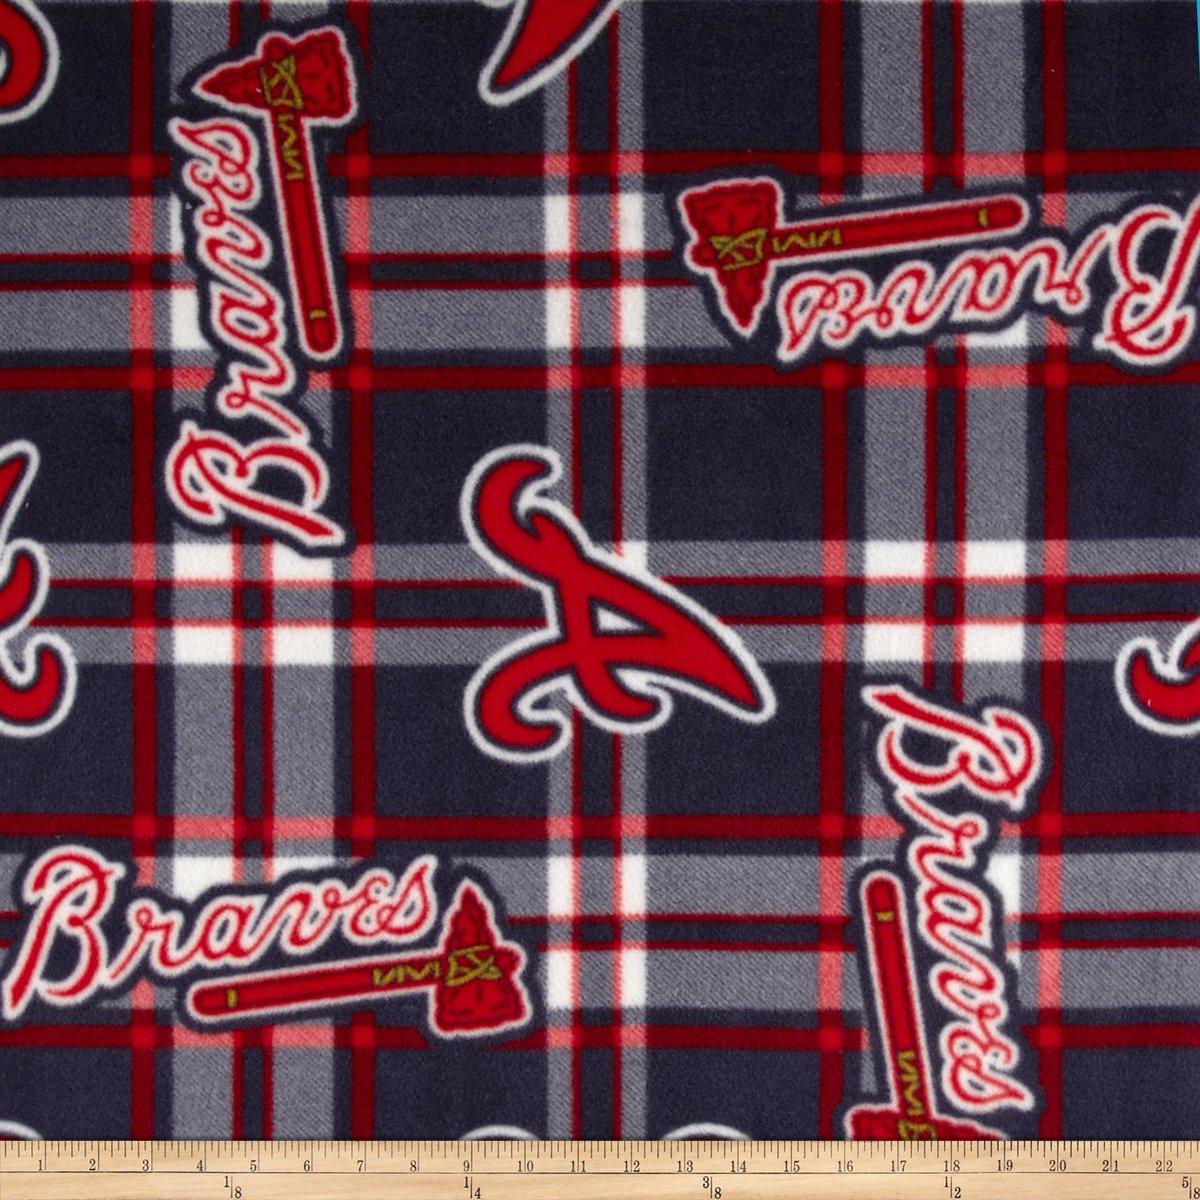 MLB Fleece Atlanta Braves Plaid Navy/Red Fabric By The Yard https://t.co/fUTaKmmCg6 #fabric https://t.co/bfcK1EDc0U